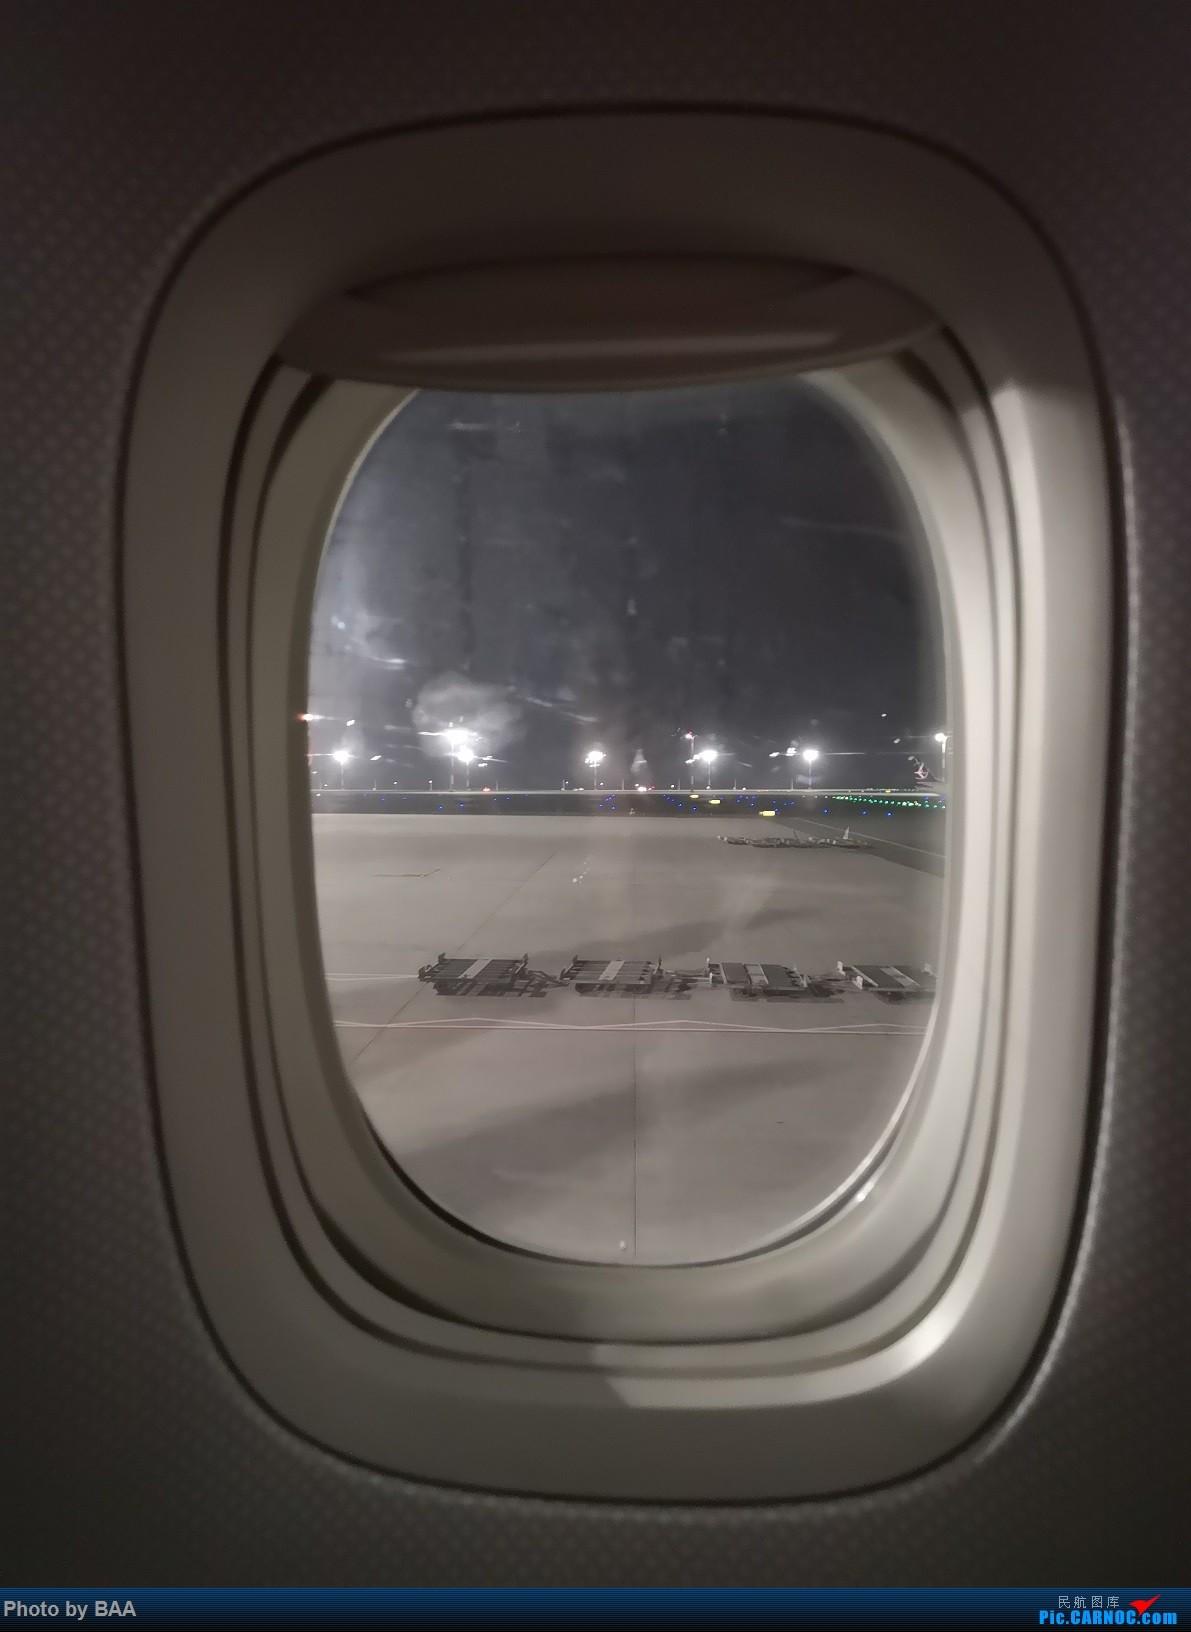 Re:[原创]《带你去旅行》之新加坡之旅(上):维也纳经伊斯坦布尔新机场飞新加坡